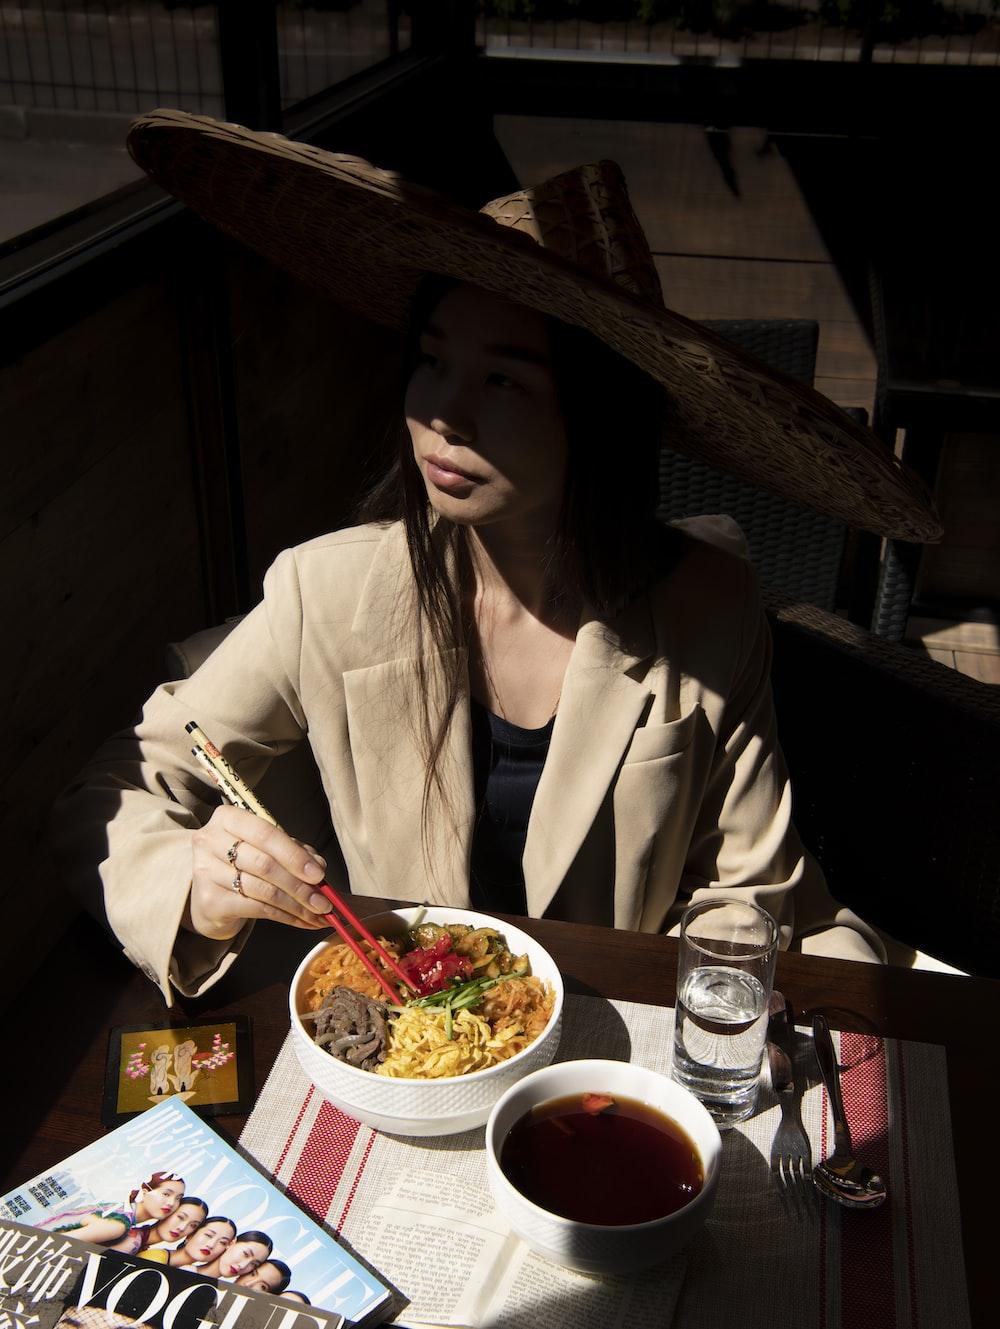 woman in white blazer holding chopsticks